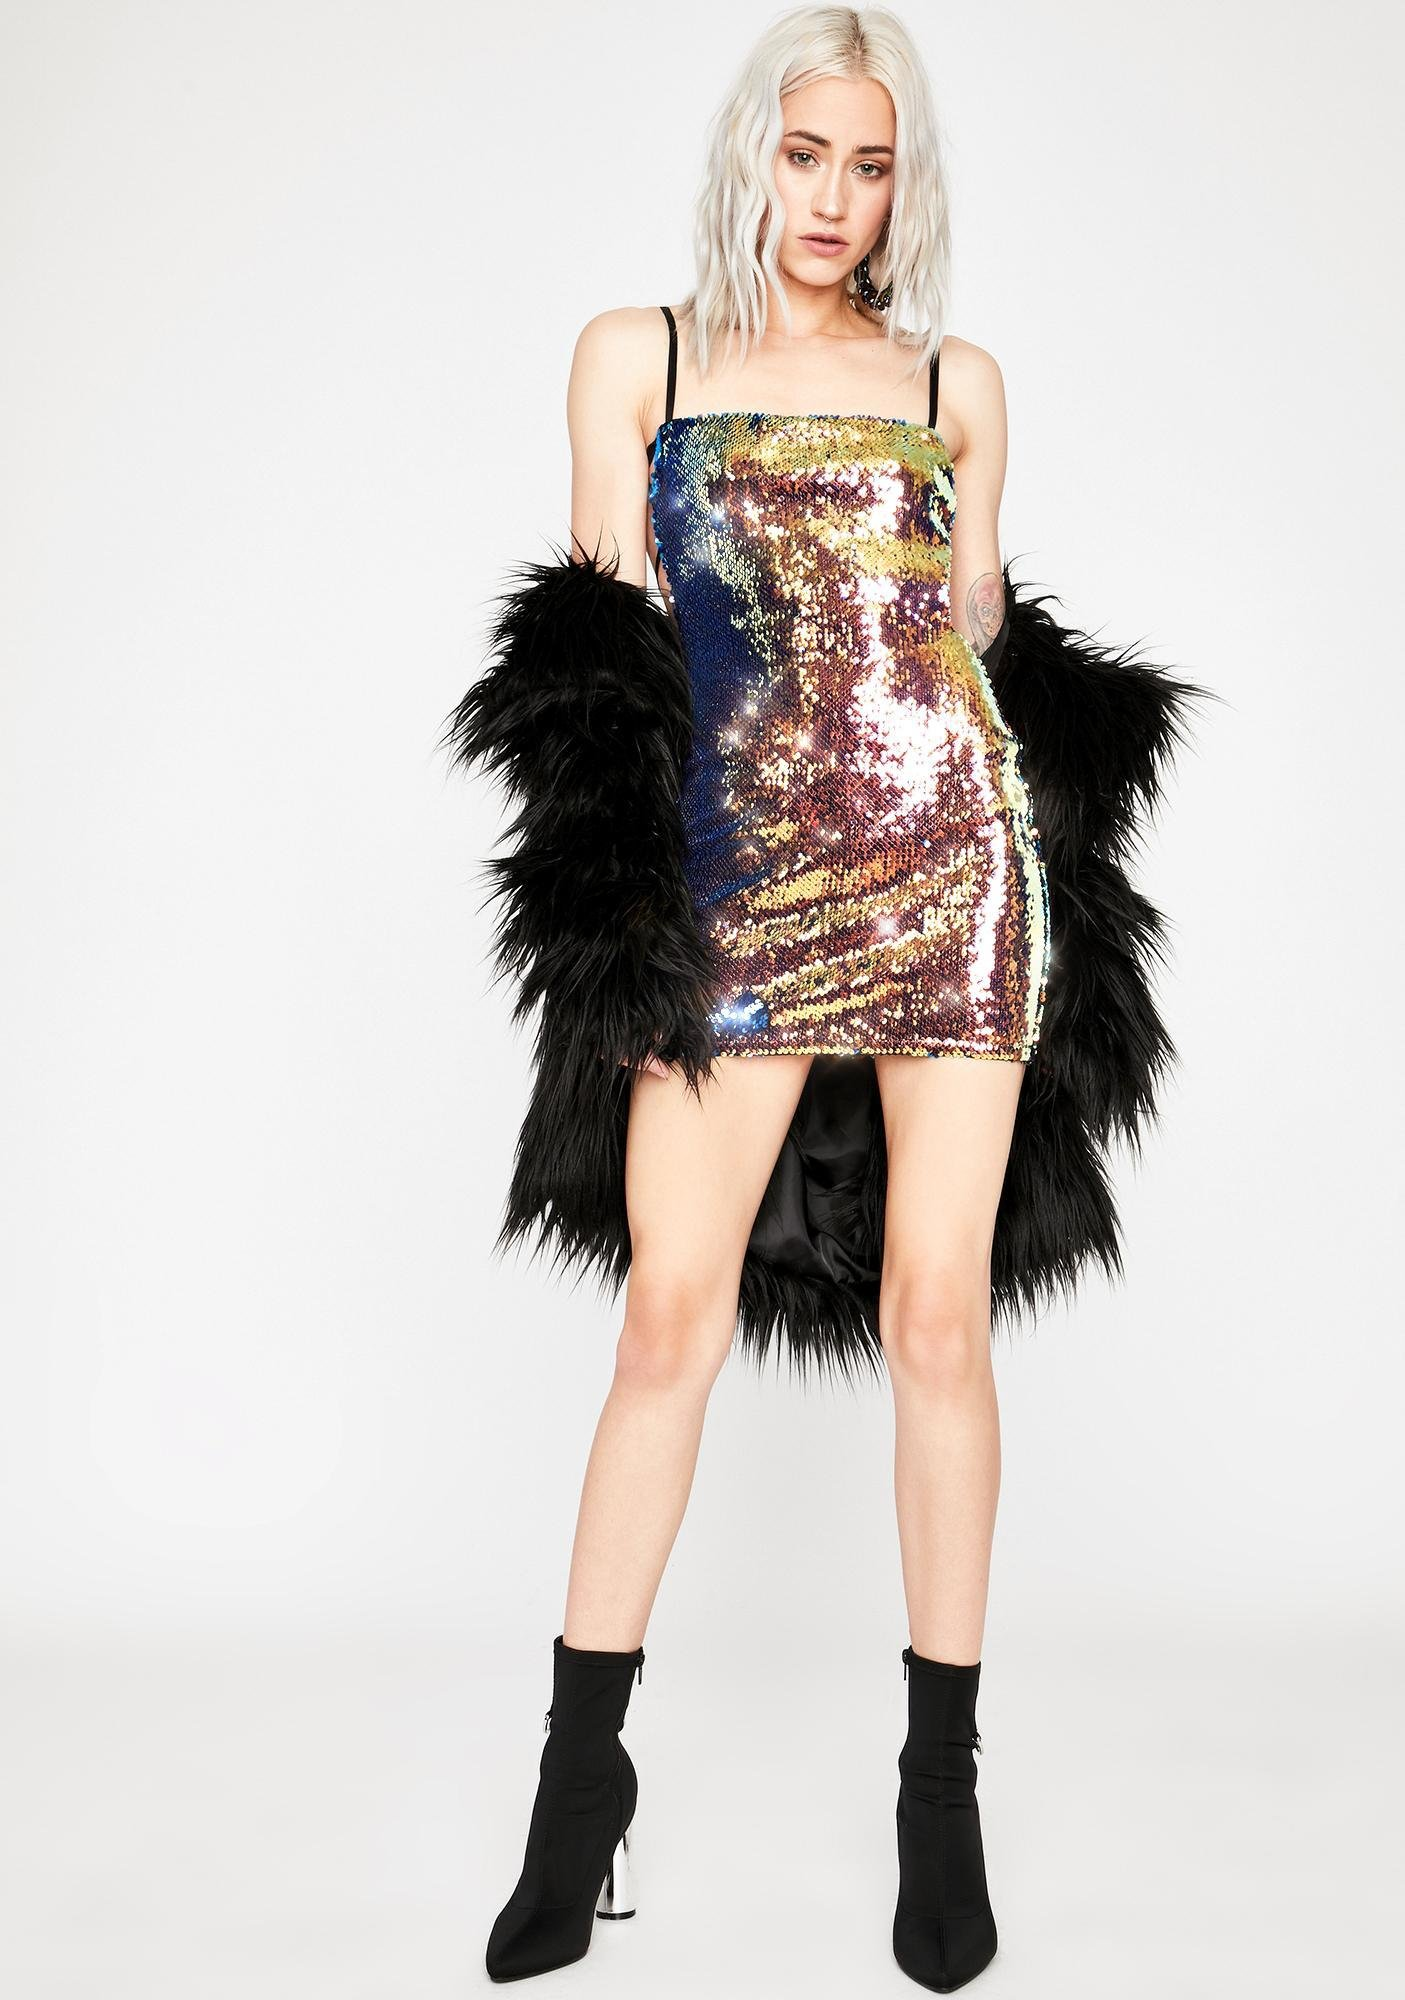 Girlz Nite Out Sequin Dress